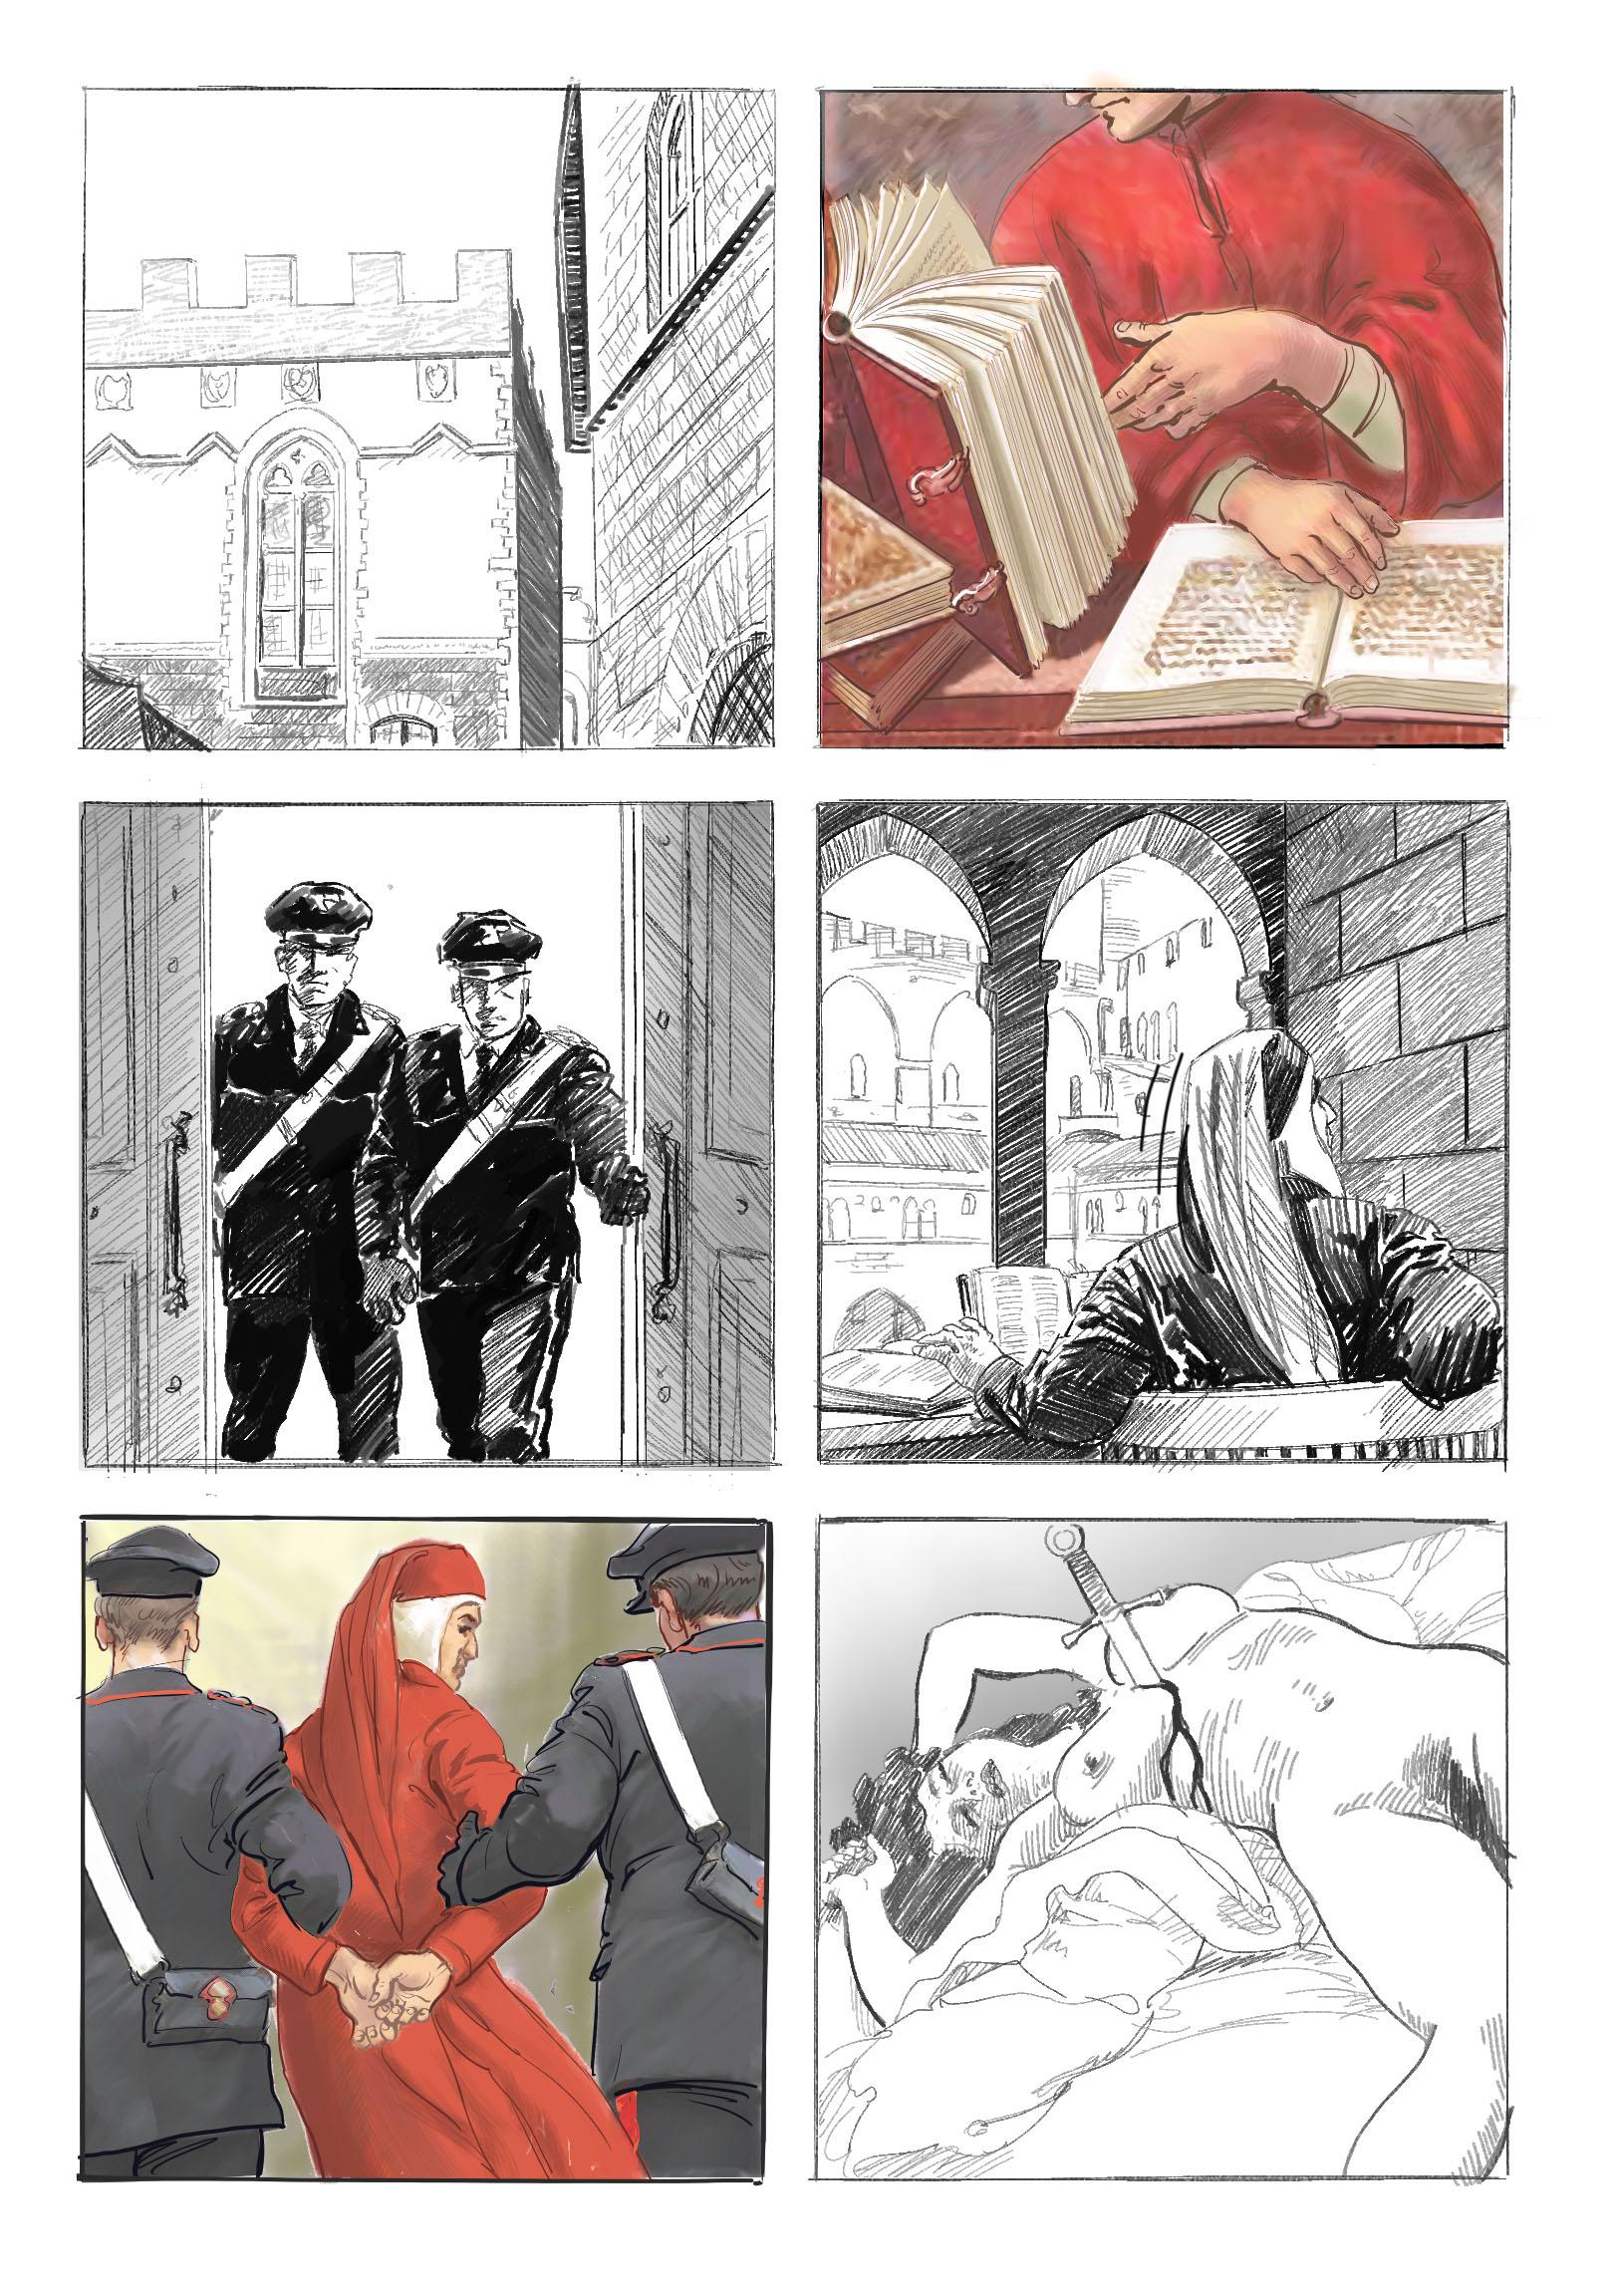 Graphic Novel celebrate 700th anniversary of Dante in 2021